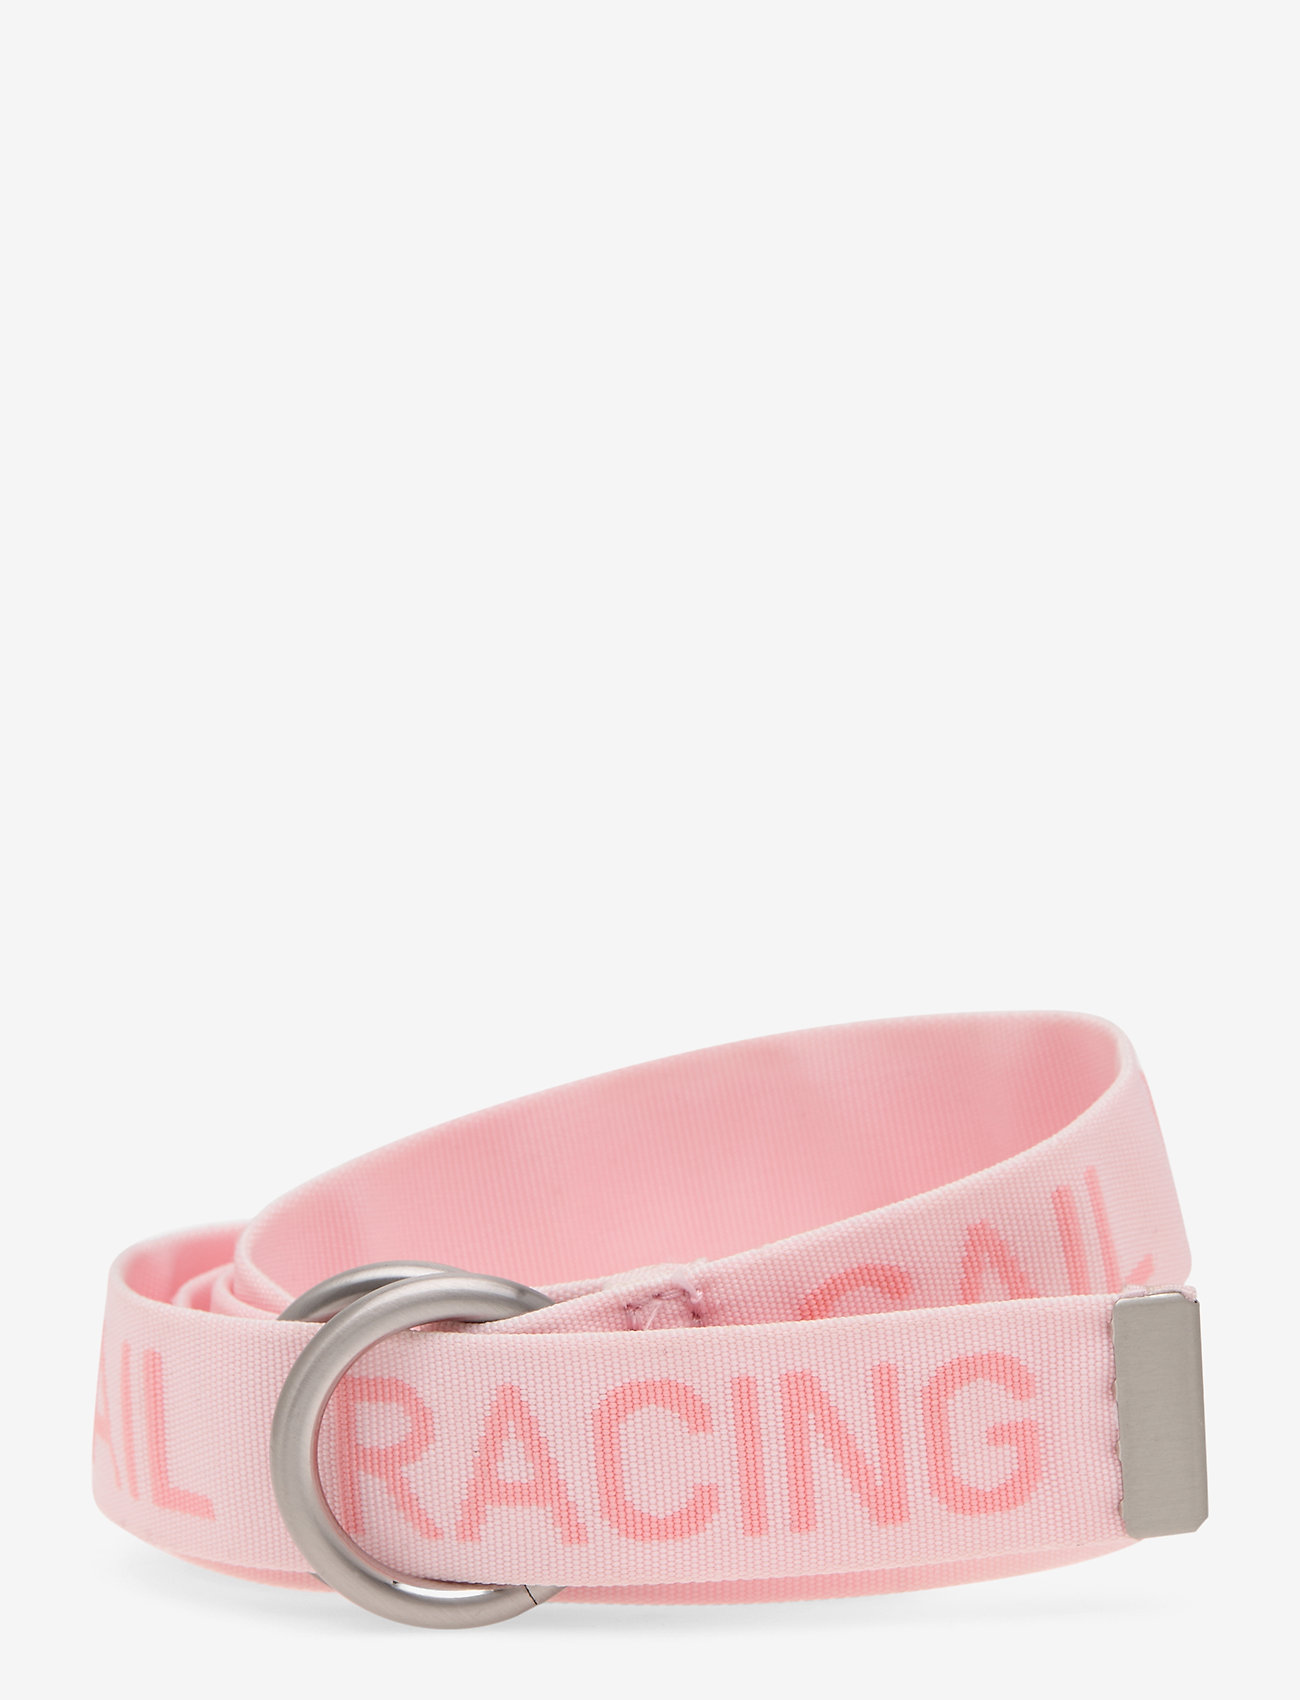 Sail Racing - W GALE BELT - sportriemen - bright pink - 0